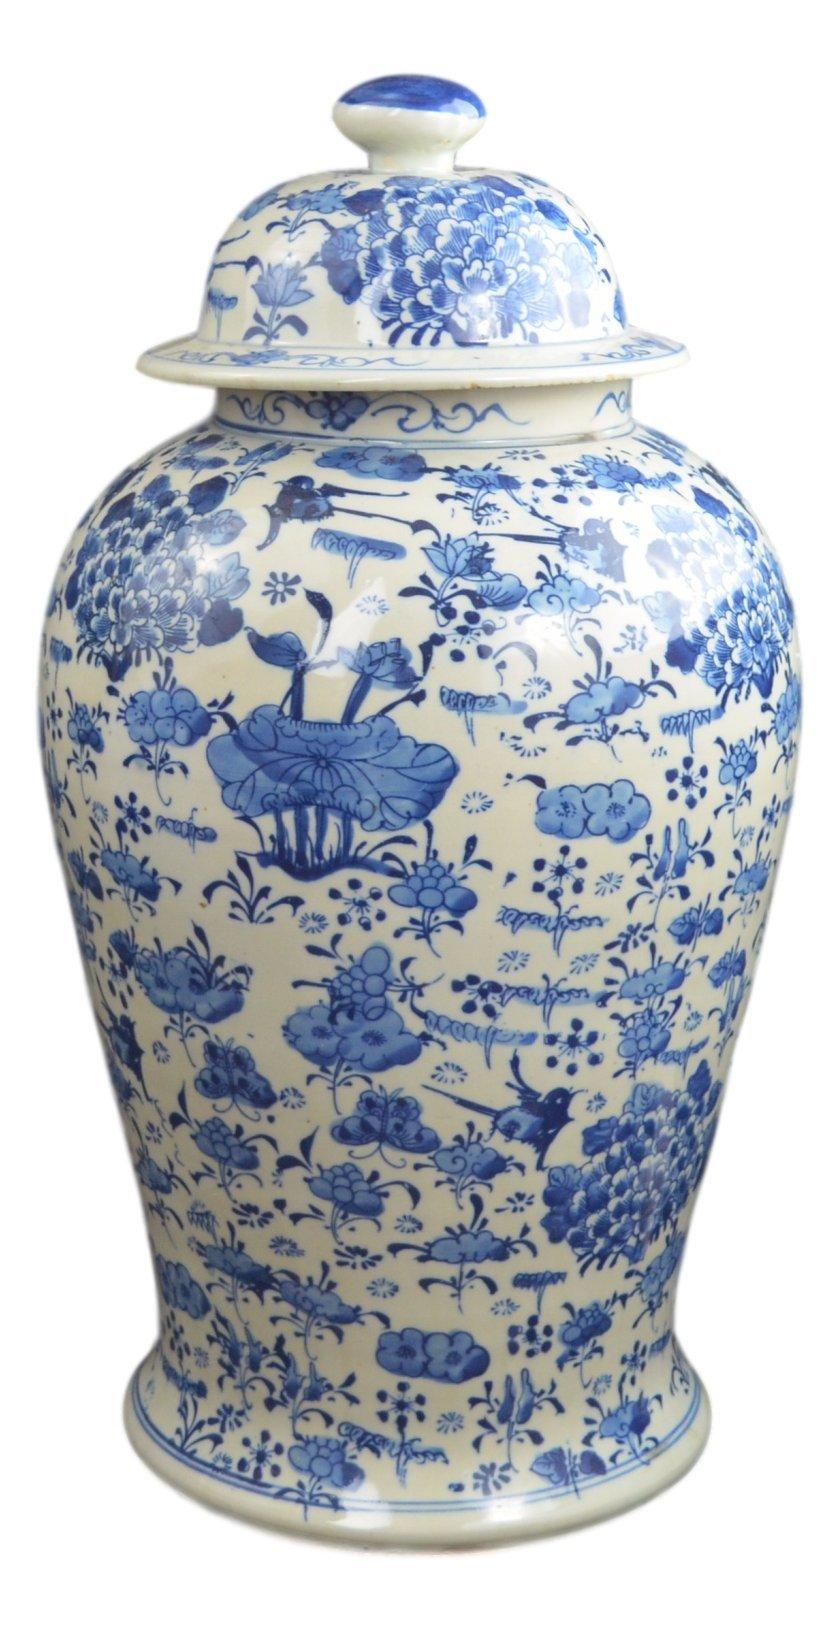 19'' Antique Finish Blue and White Porcelain Lotus Temple Ceramic Jar Vase, China Ming Style, Jingdezhen (L6)